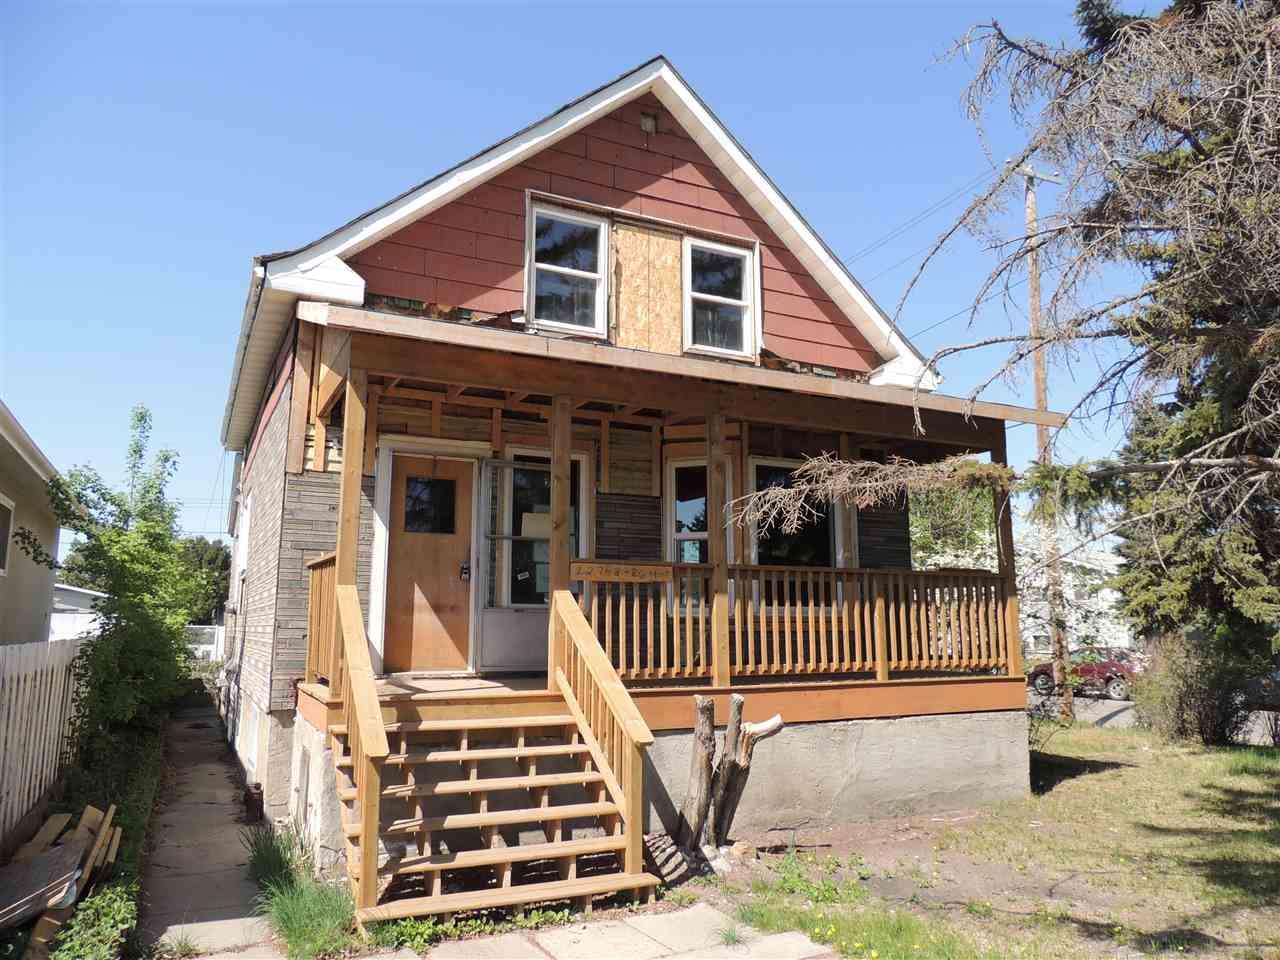 Property, 1 bed, at $224,900